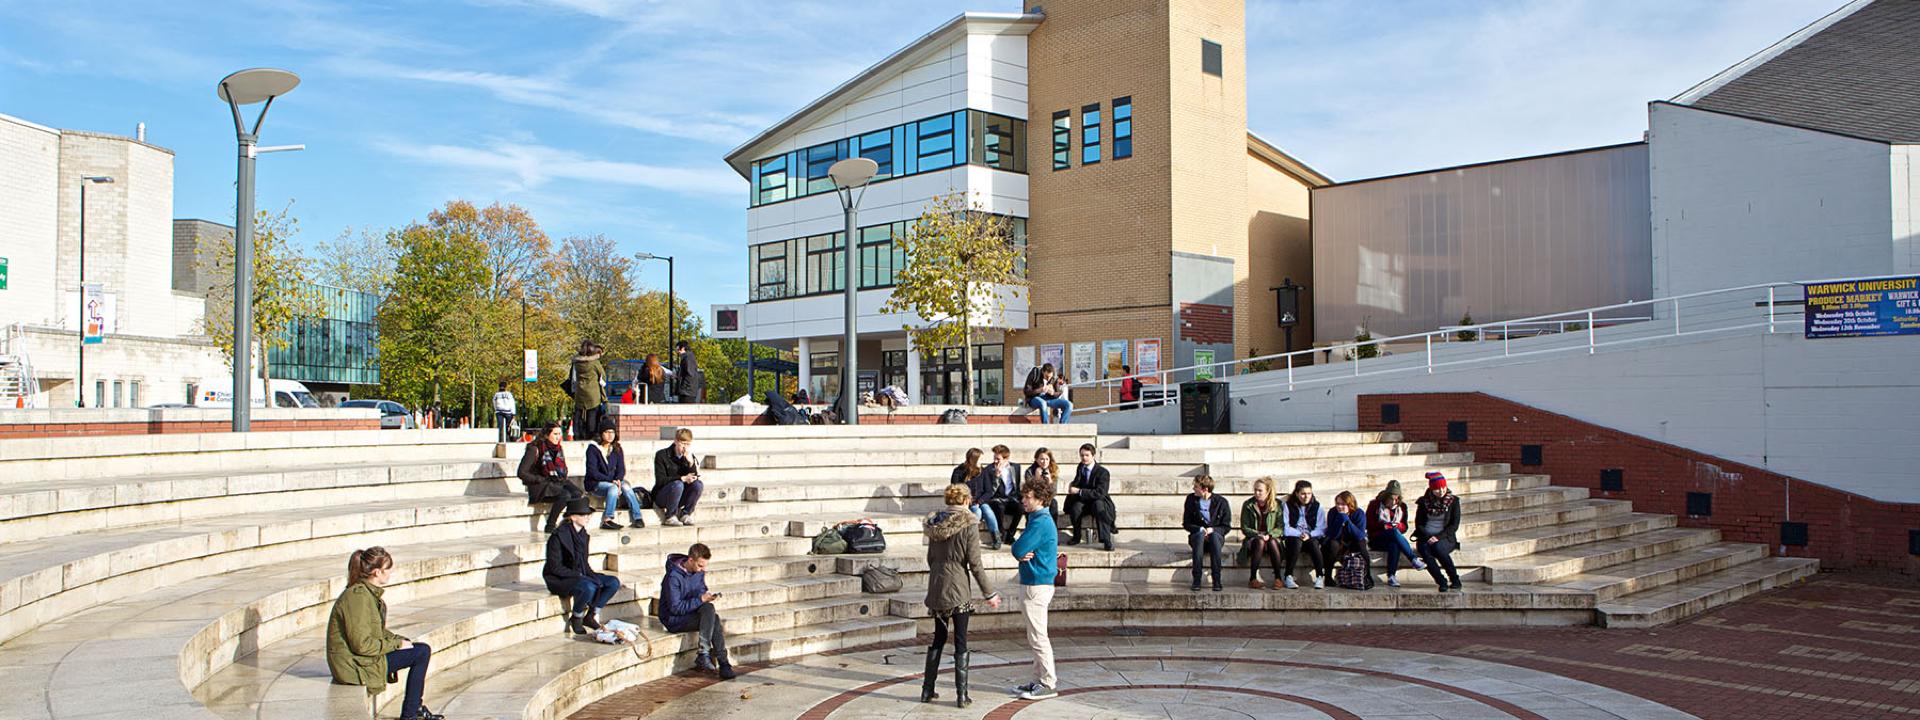 University of Warwick - Bright Future Scholarship